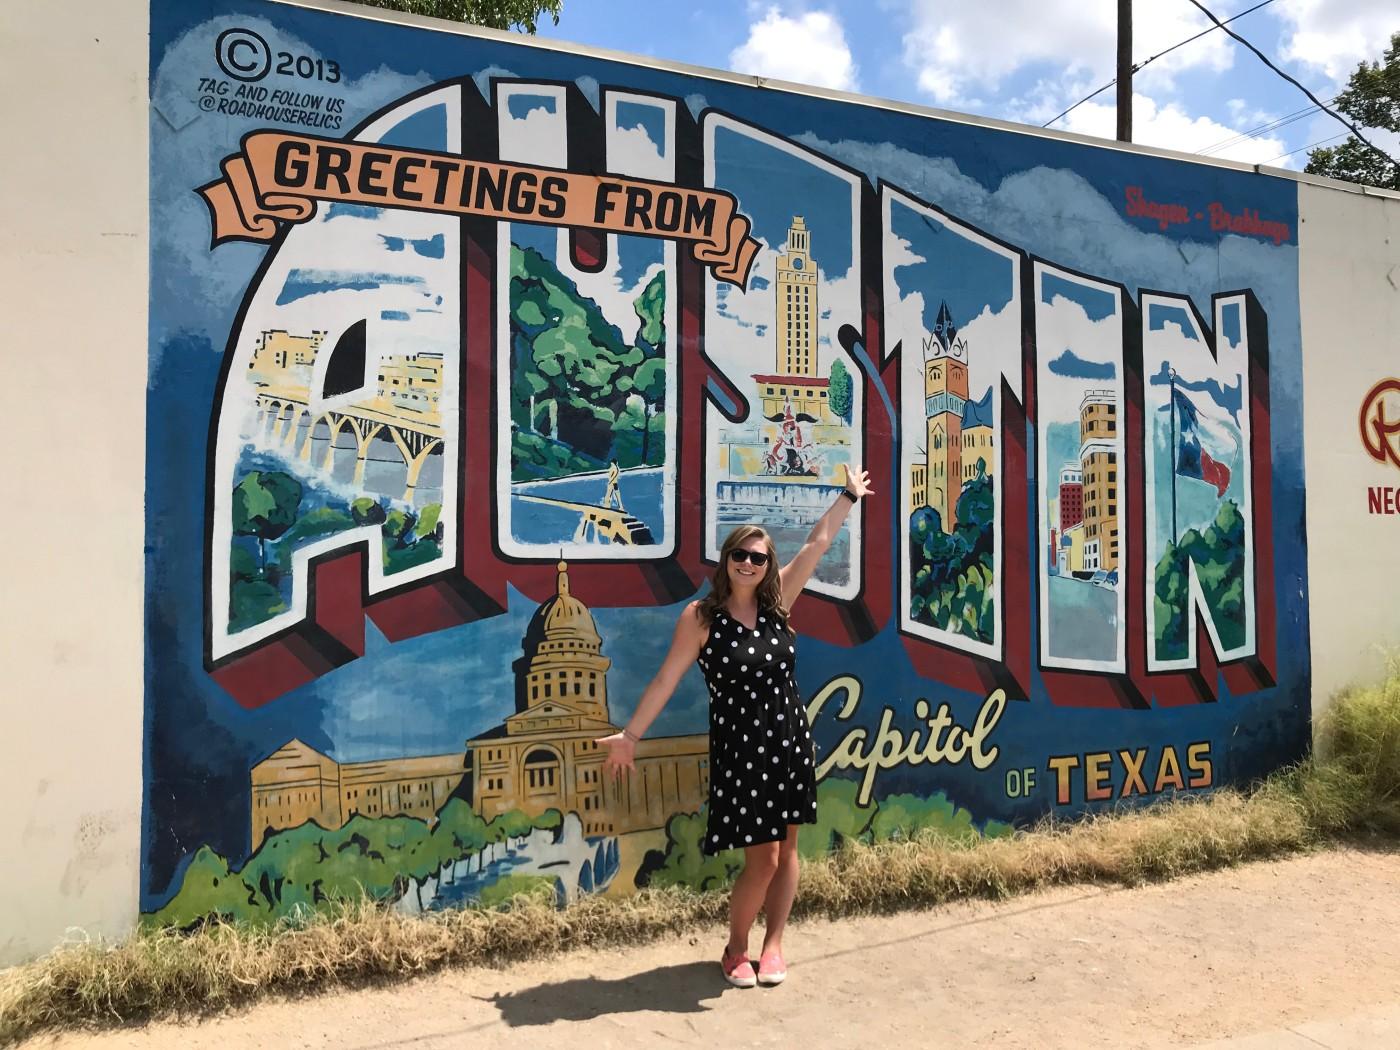 Greetings from Austin mural graffiti capitol of Texas postcard